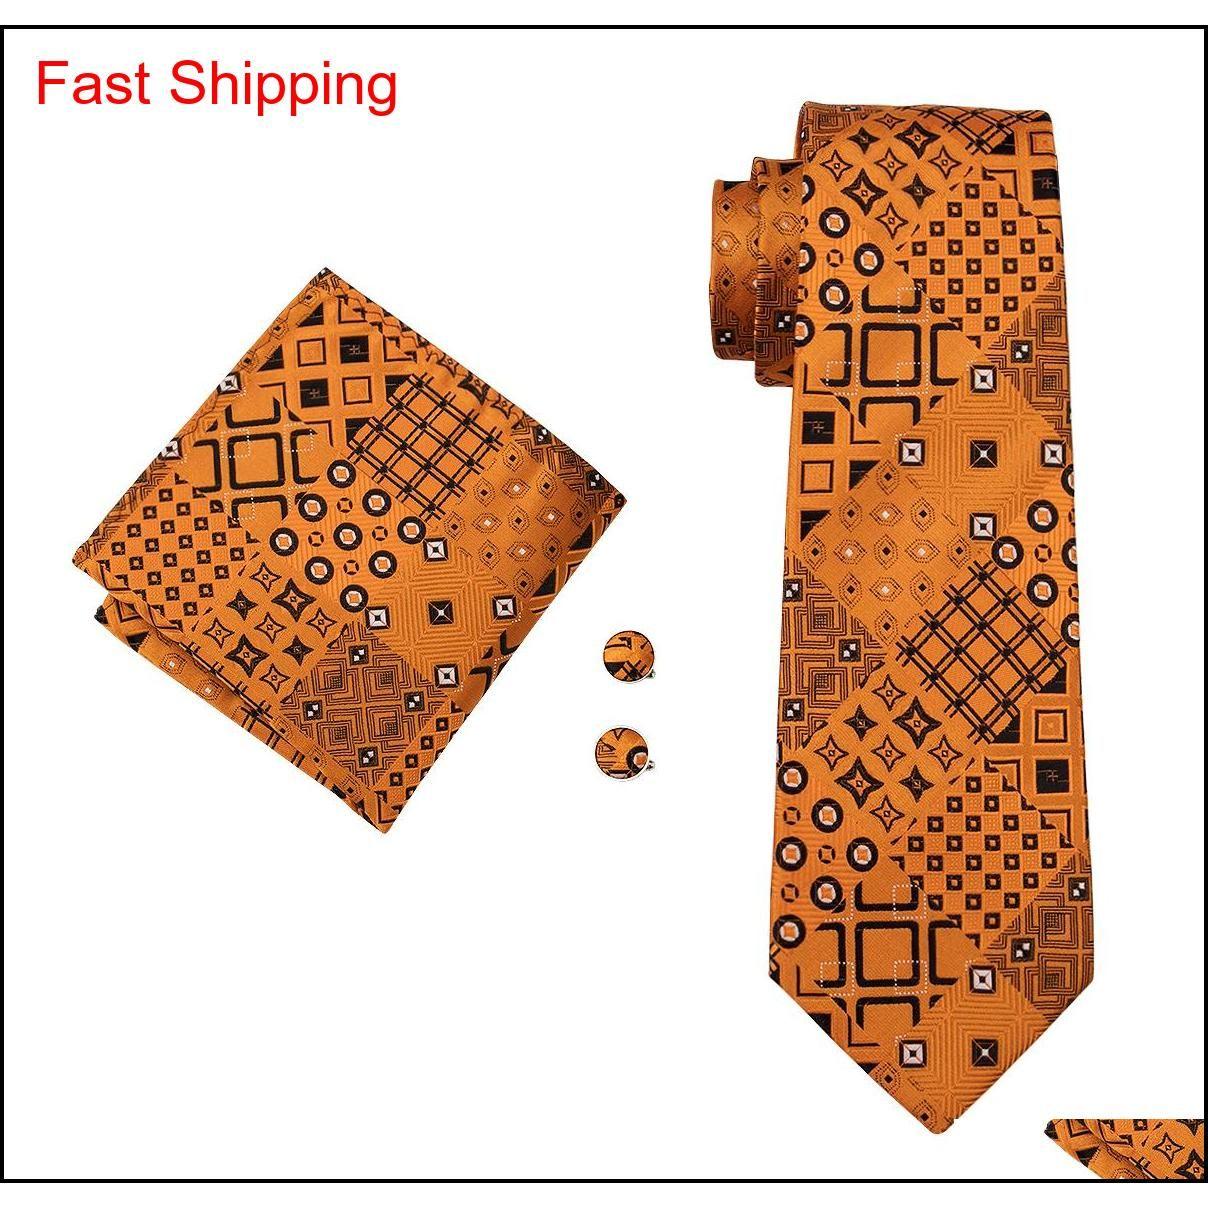 Moda uomo cravatta ClassCi Seta Mans Collo Cravatta Gold Tie Set Tie Tie Hanky Gemelli Set Jacquard Tessuto Meeting Business We Qylgqn Queen66